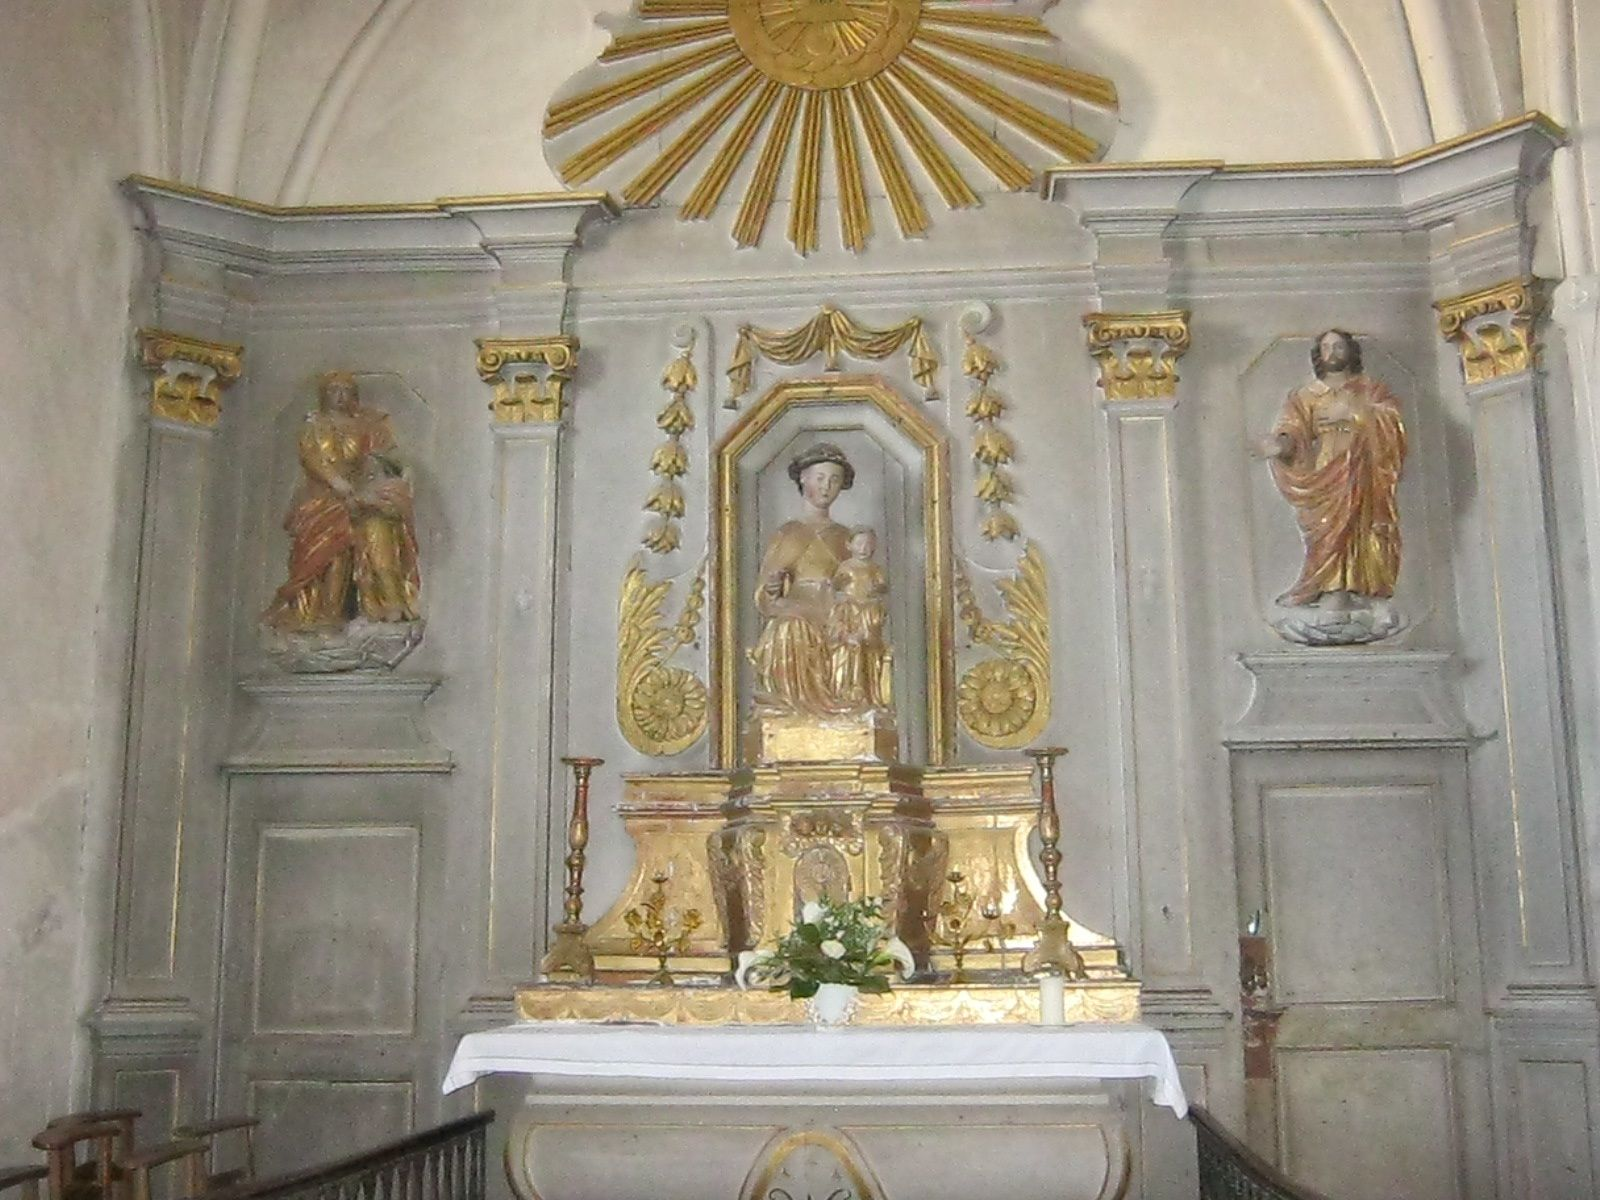 Eglise Romane Sainte-Morille